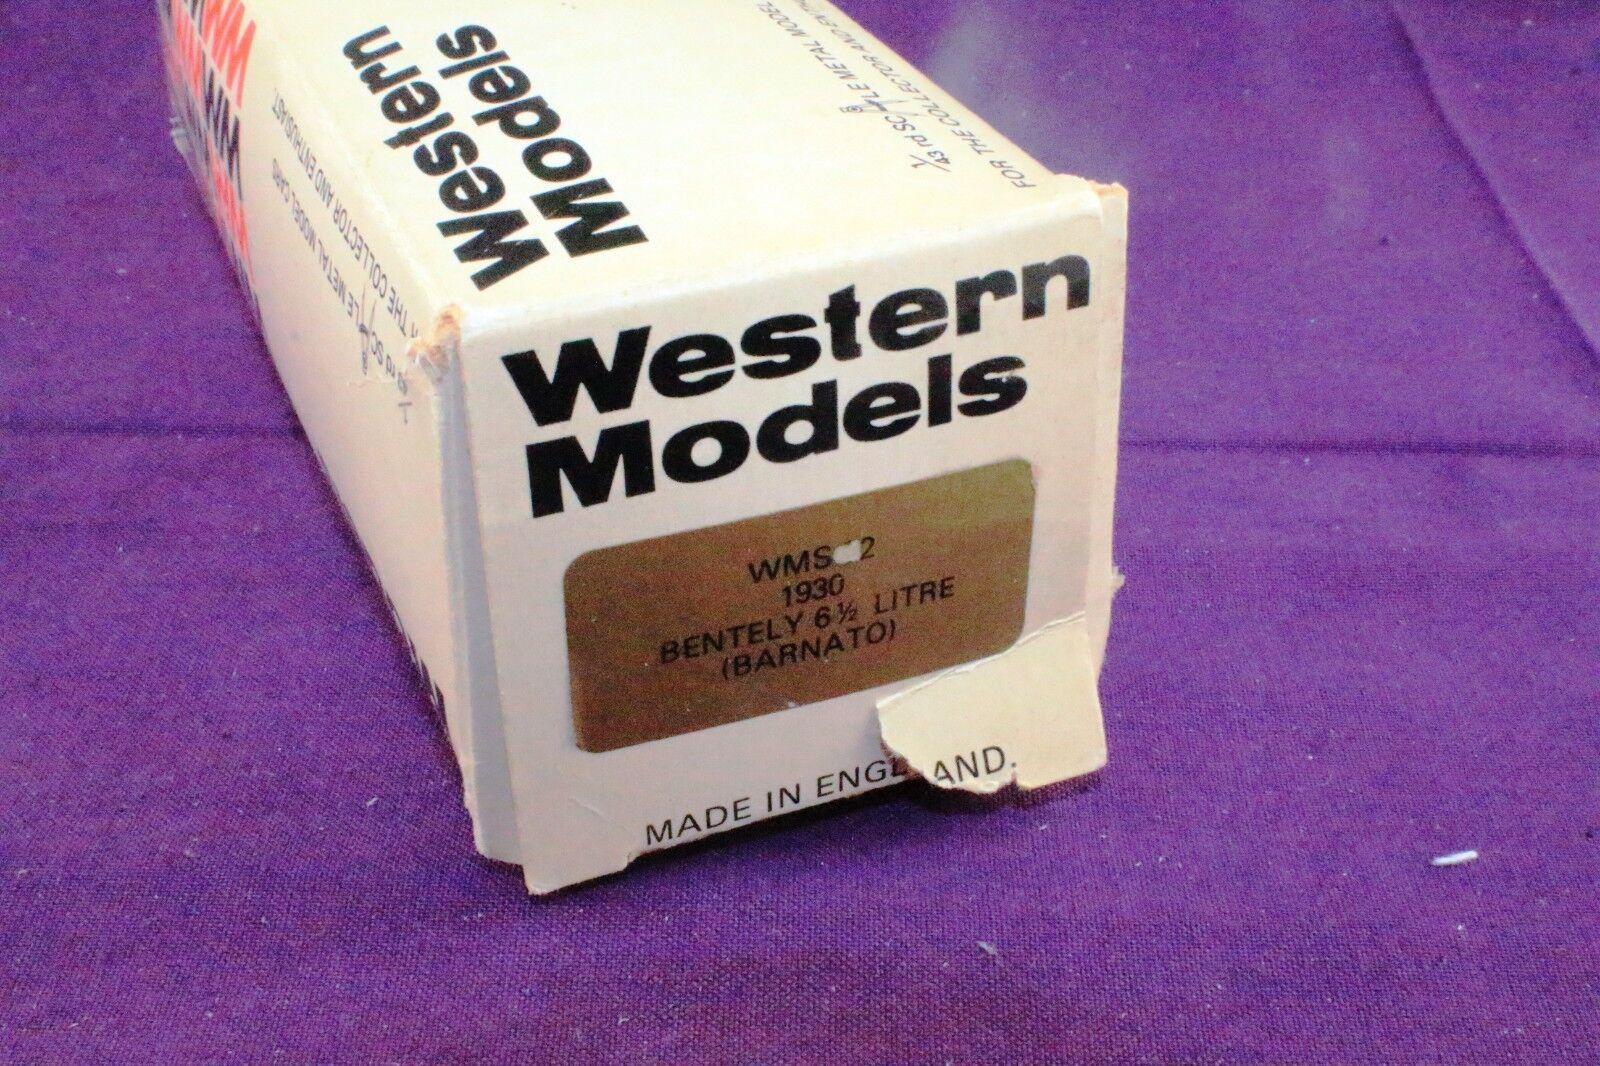 Western Models WMS32 WMS32 WMS32 1930 Bentely 6 1 2 Litre  BARNATO  Made in England f127c3